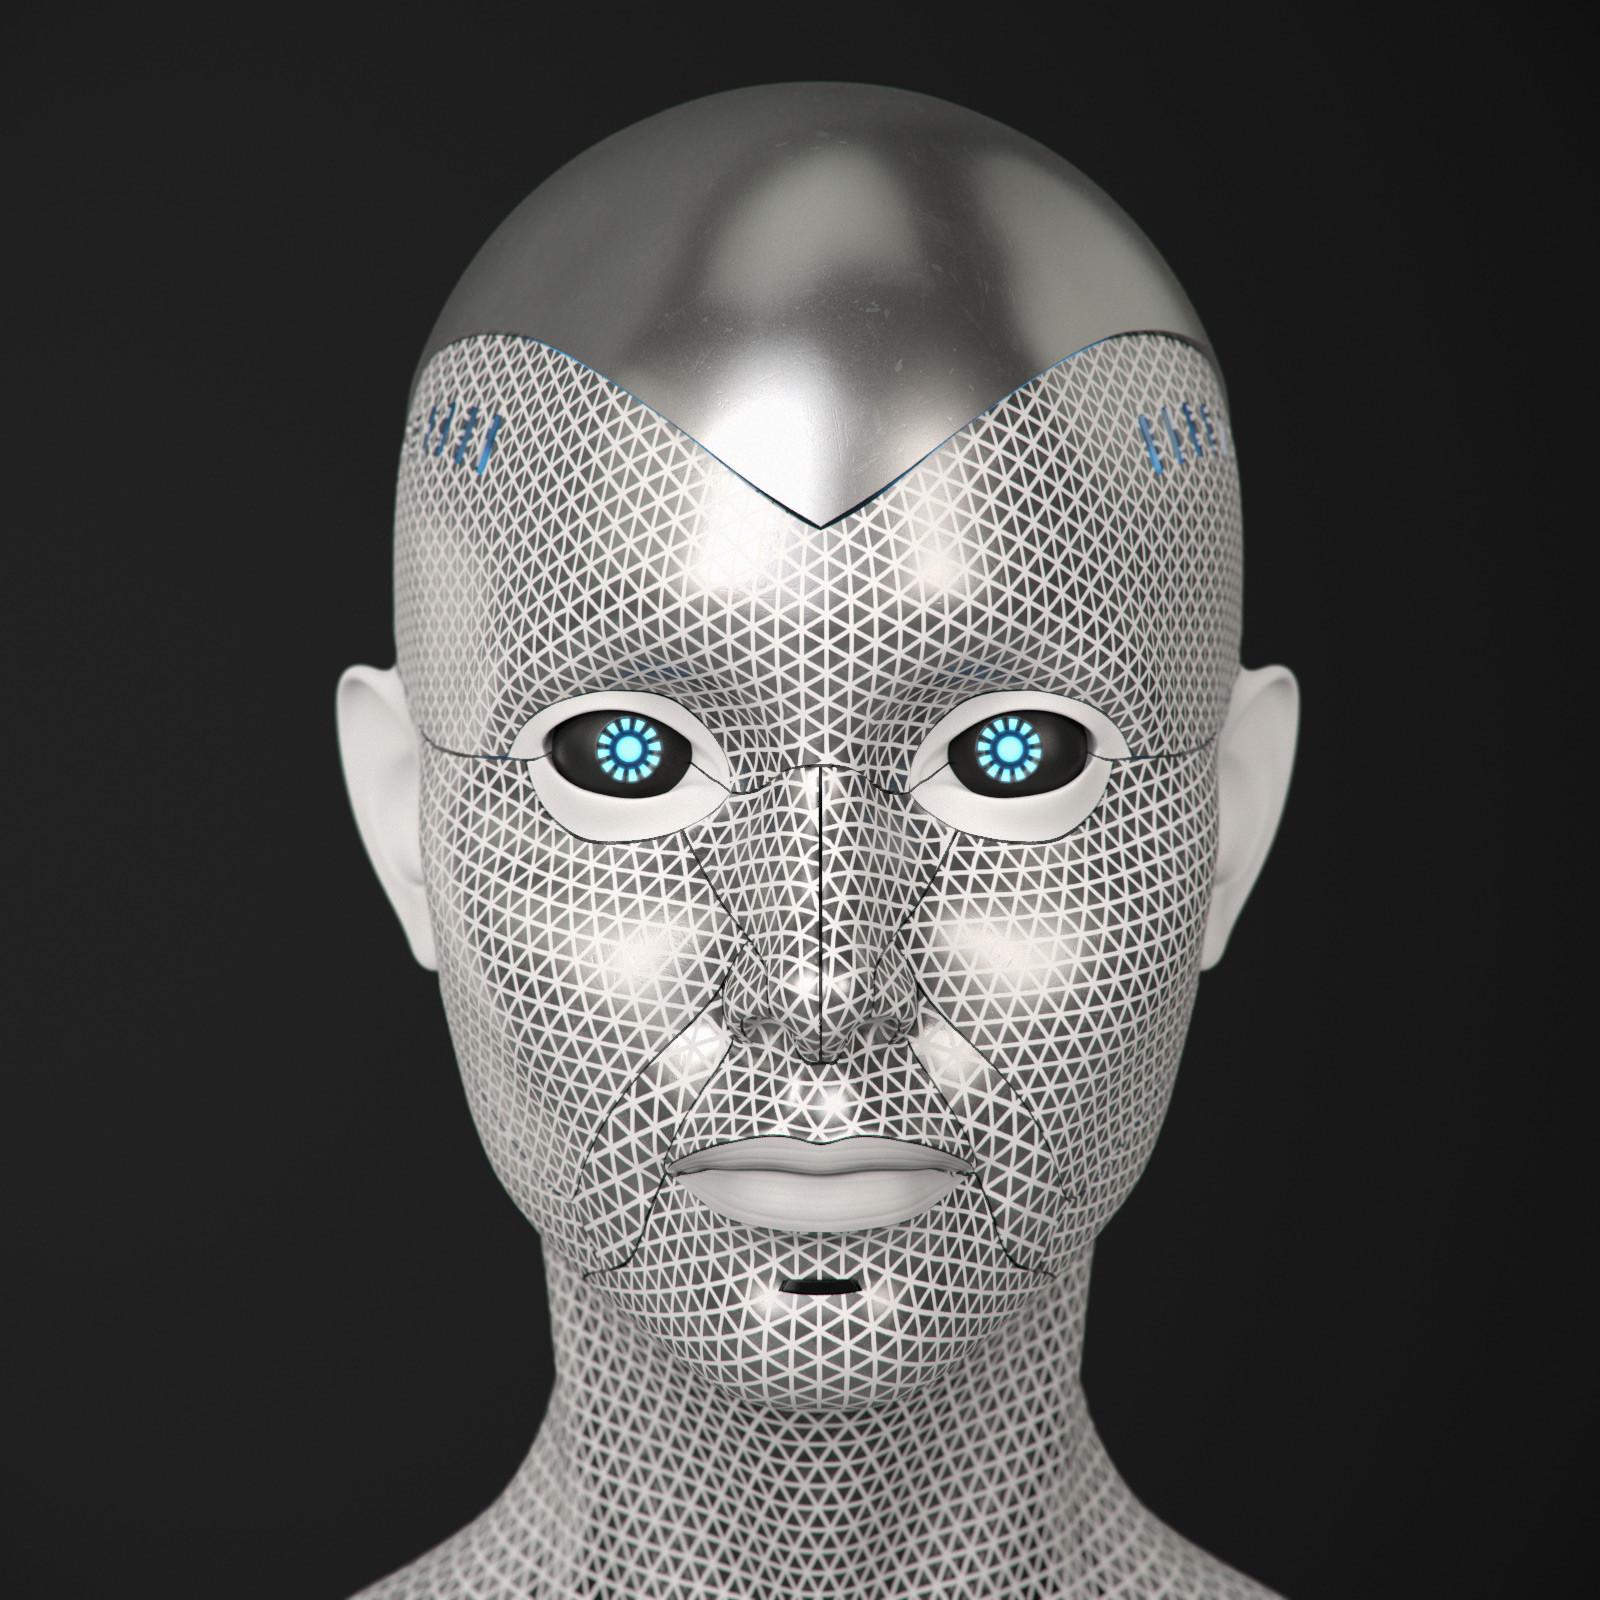 Cgmonkeyking dvc face cyborg pn01 pp01 front